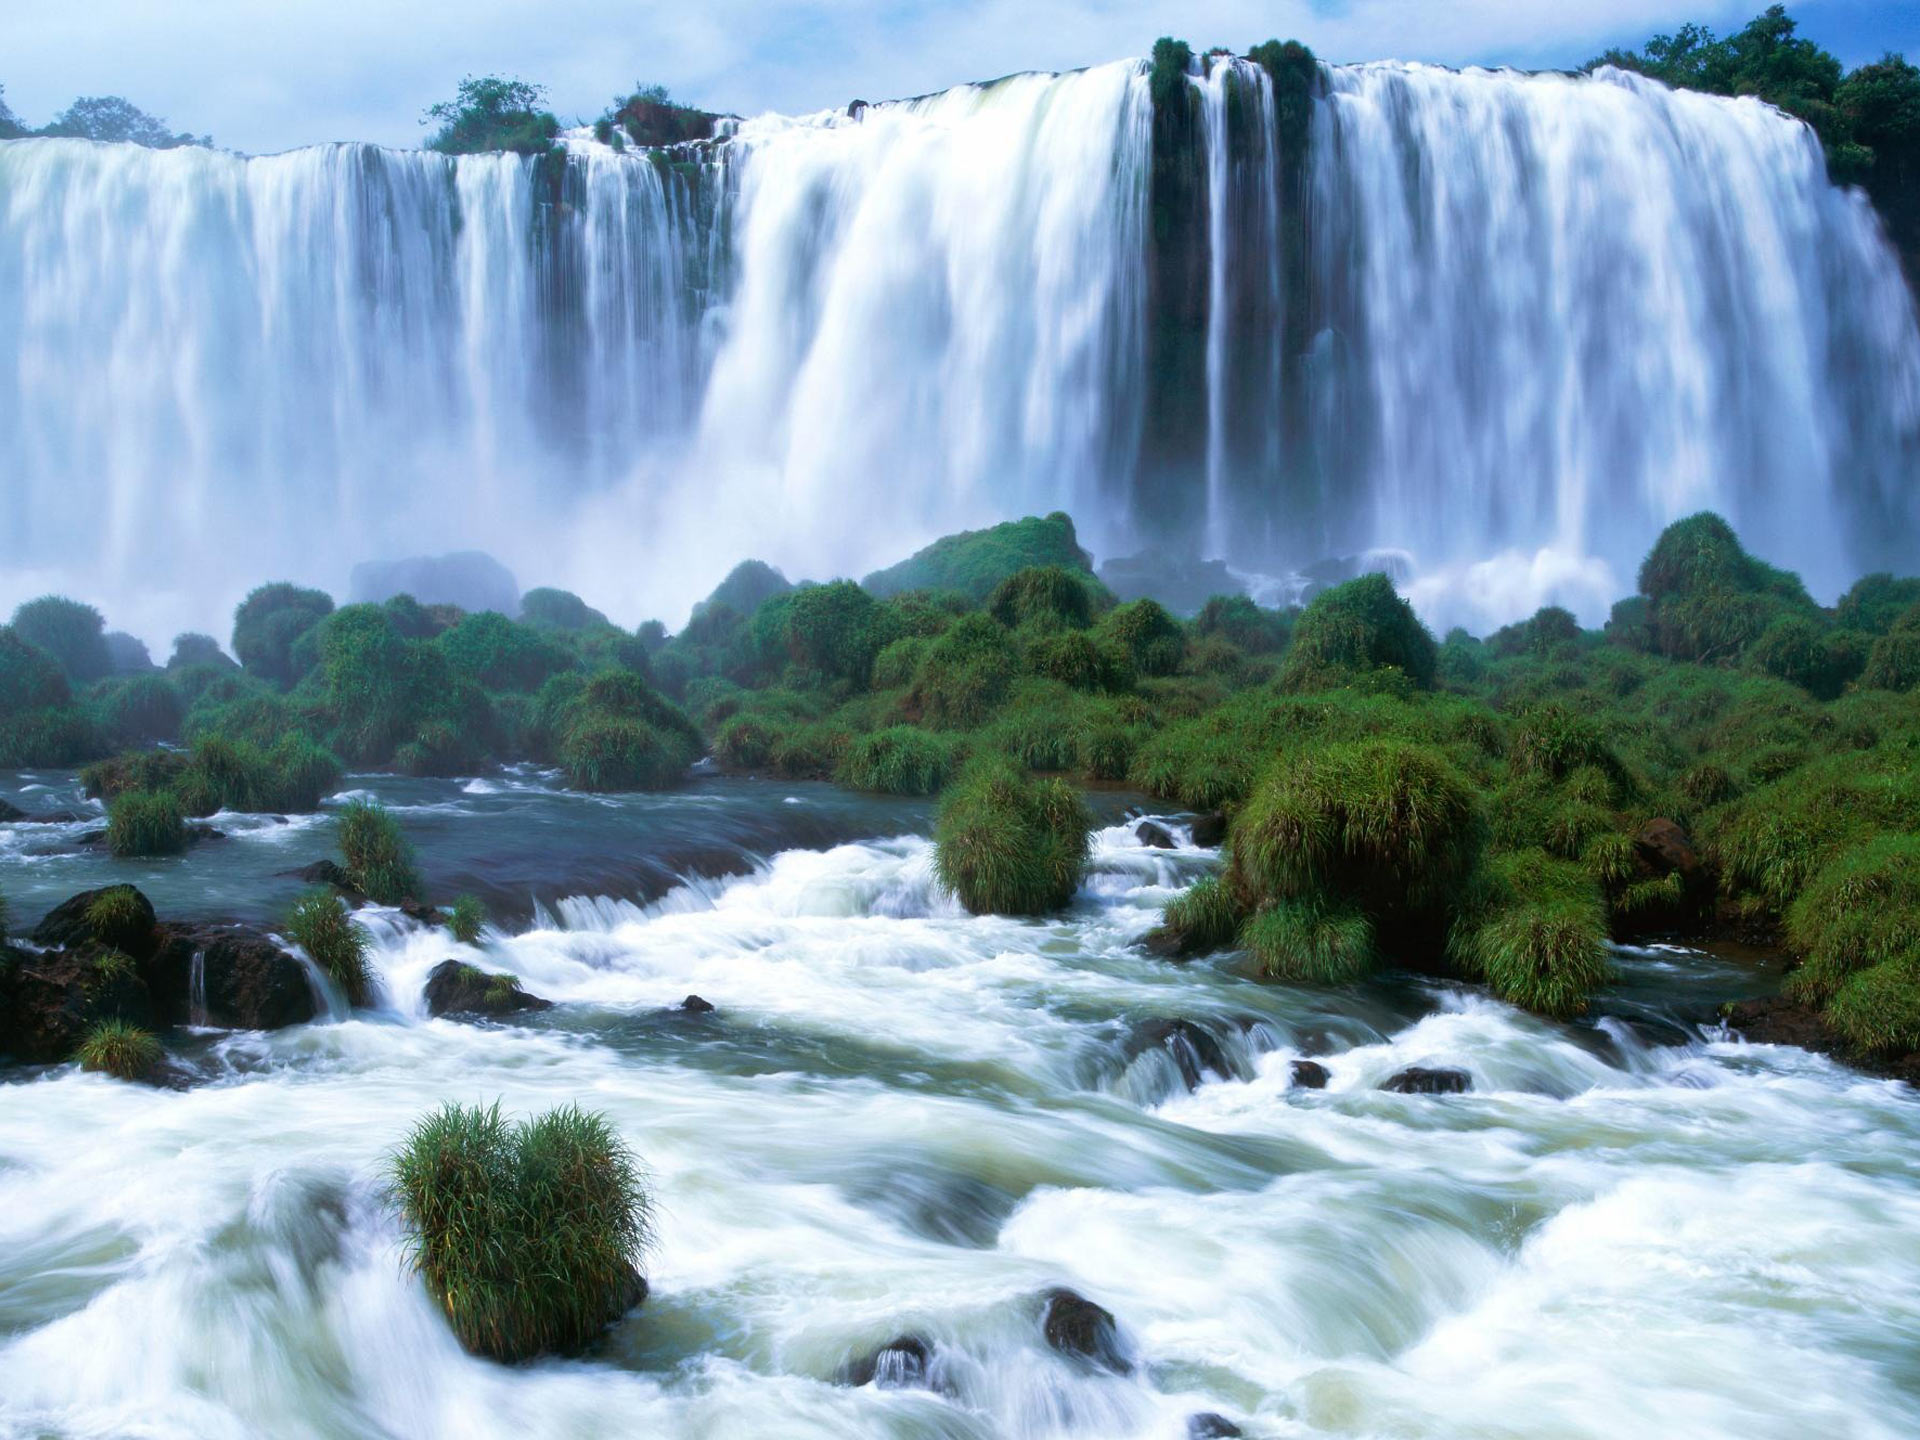 Brazil Waterfall Wallpaper 1920x1440